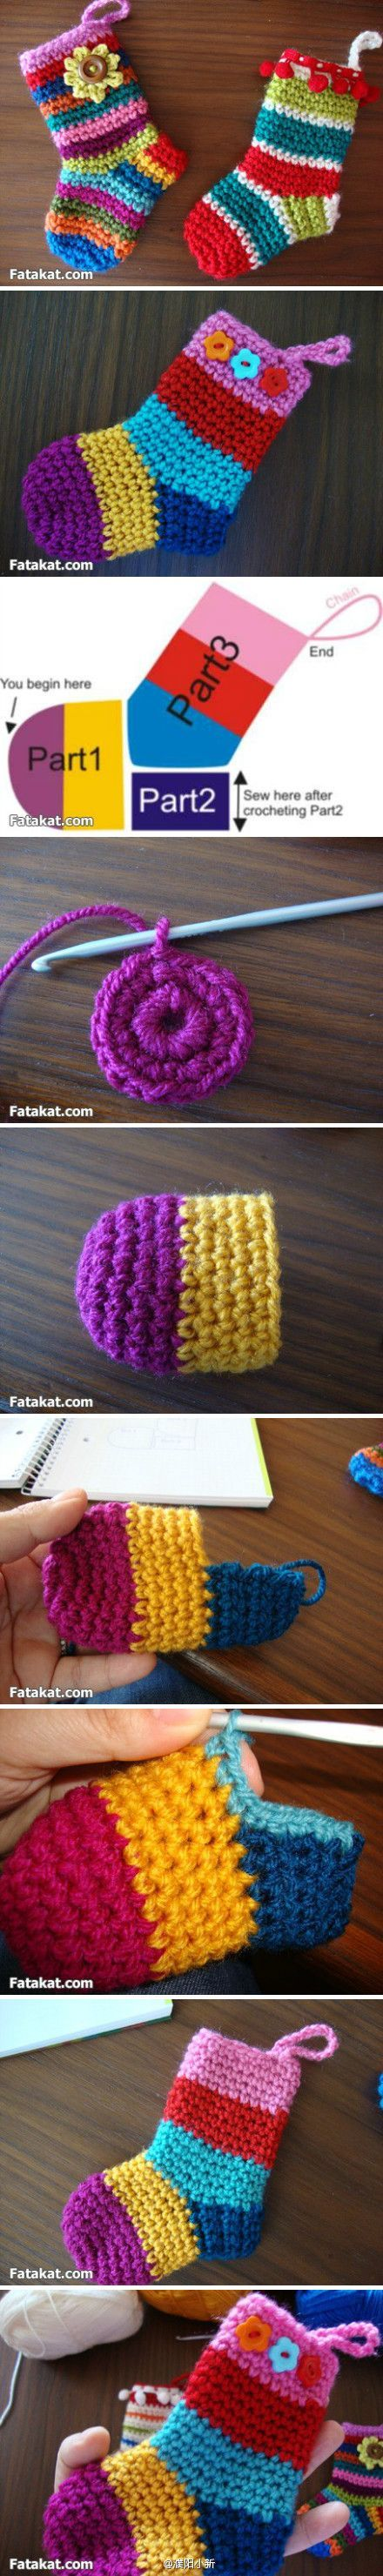 diy-crochet-baby-stocking